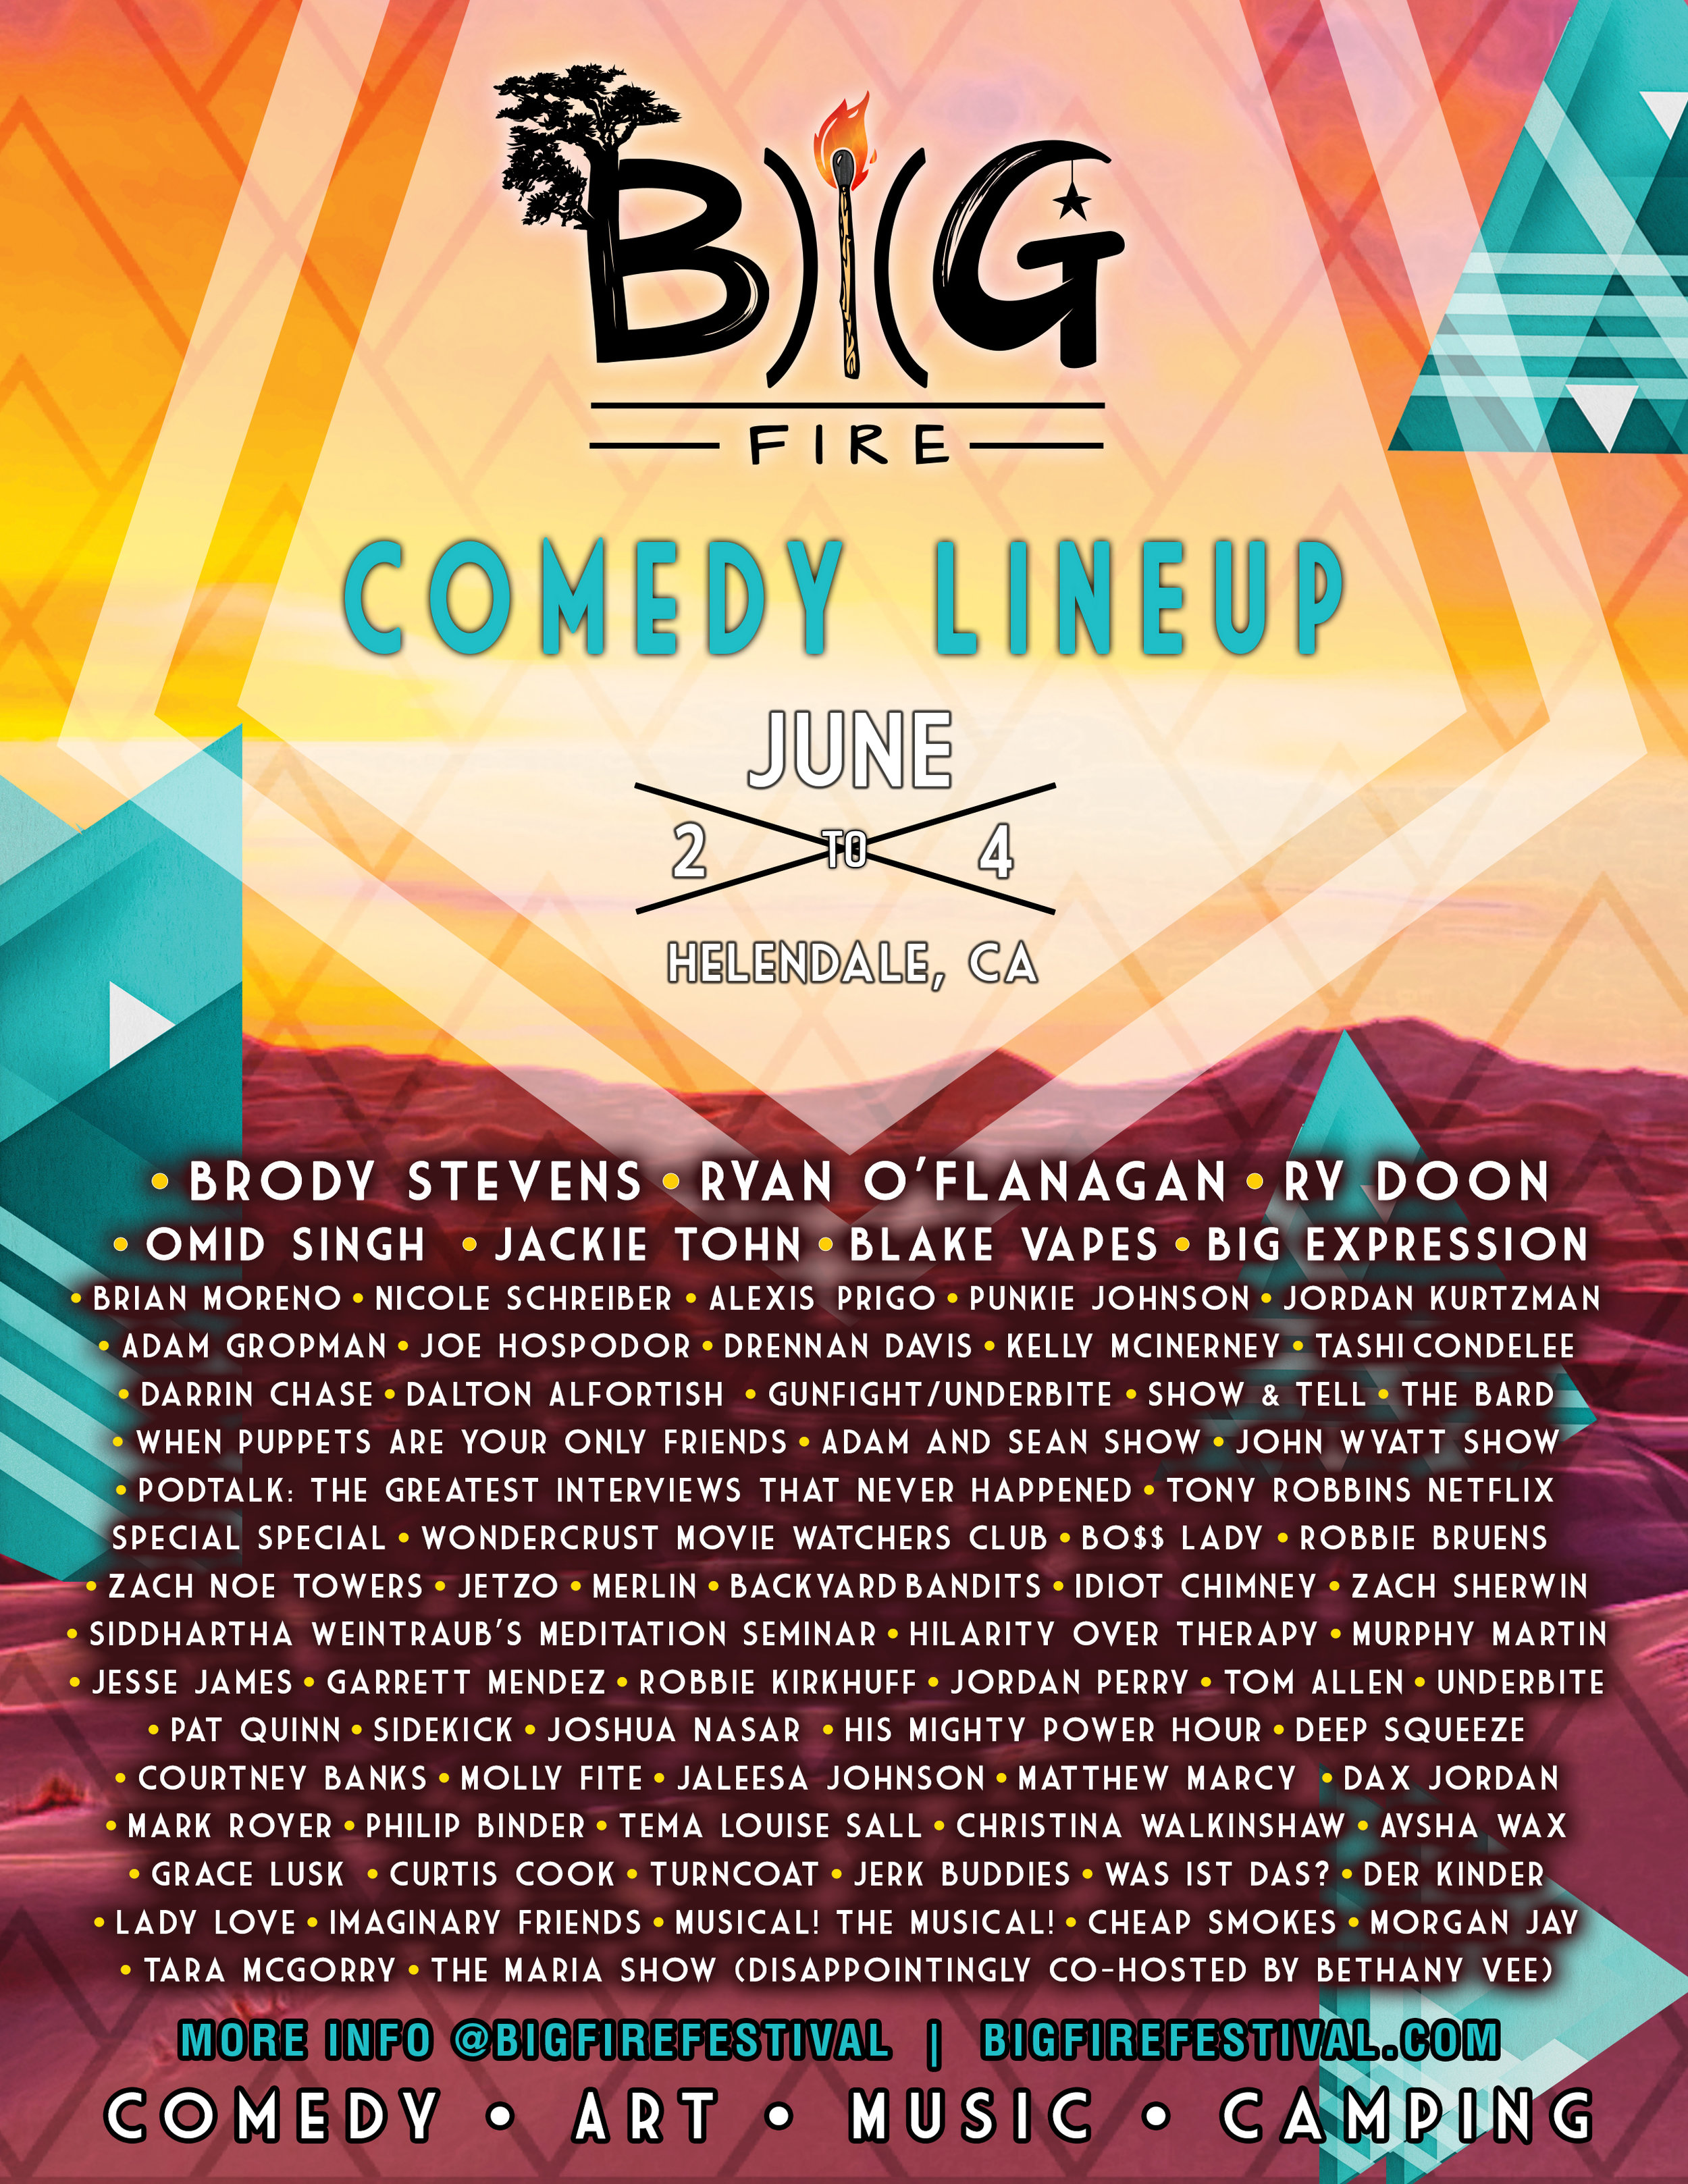 big fire comedy lineup